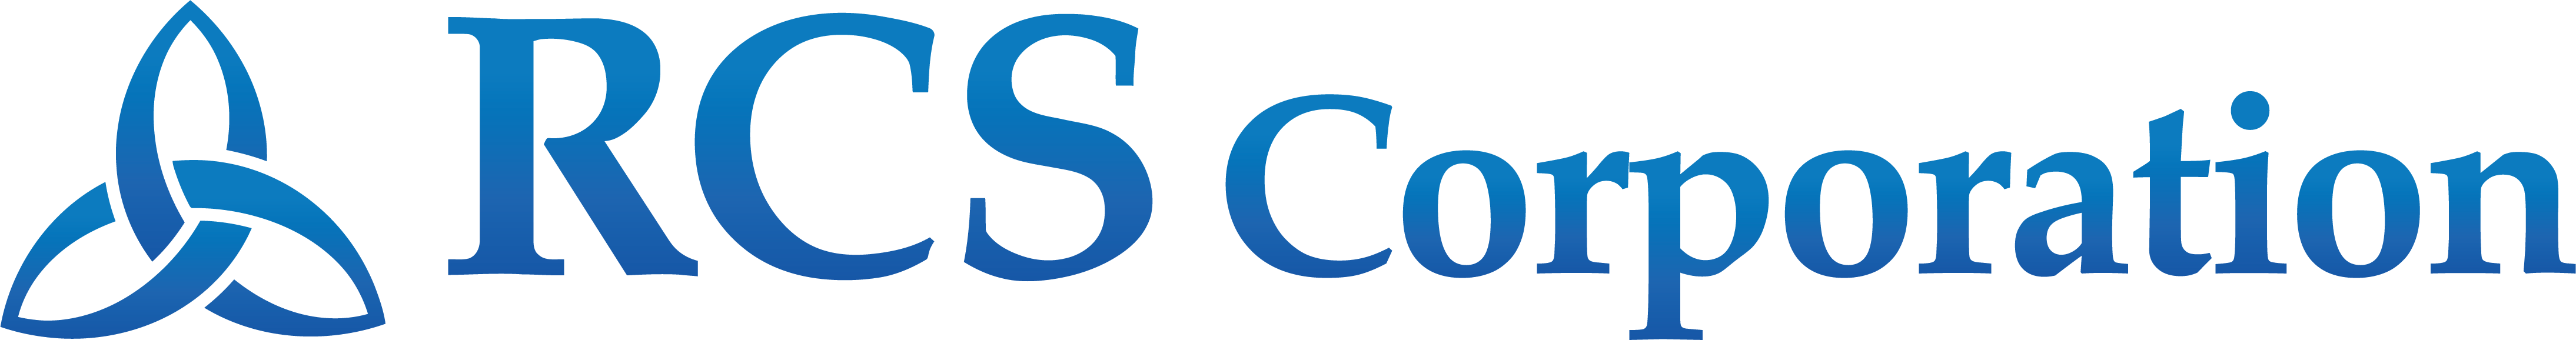 RCS Corporation